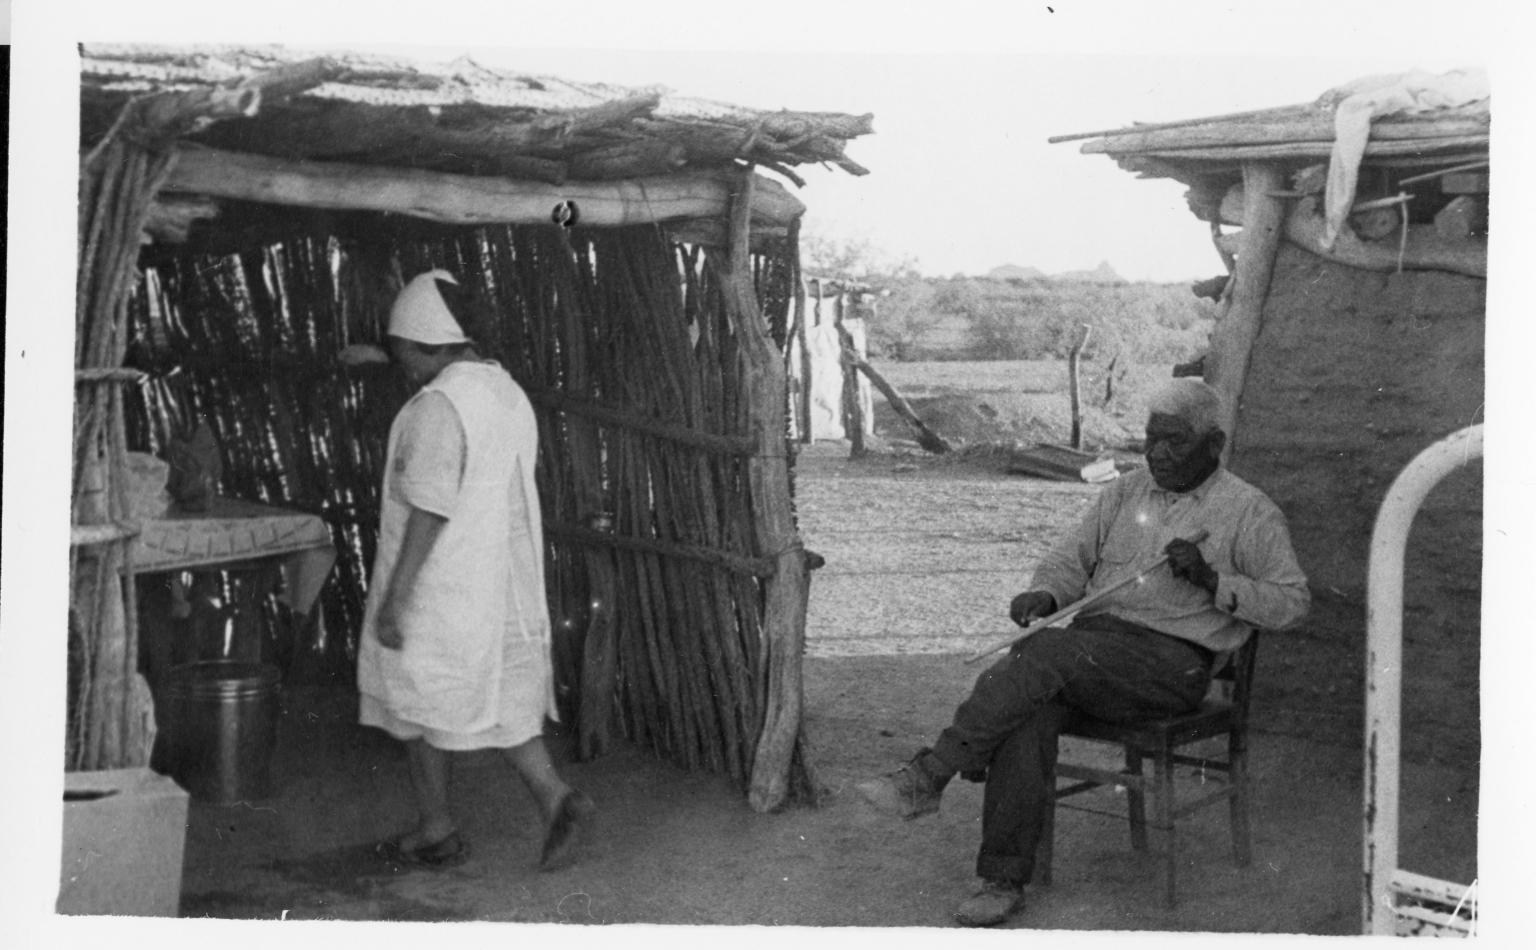 Unidentified Tohono O'odham Woman and Man